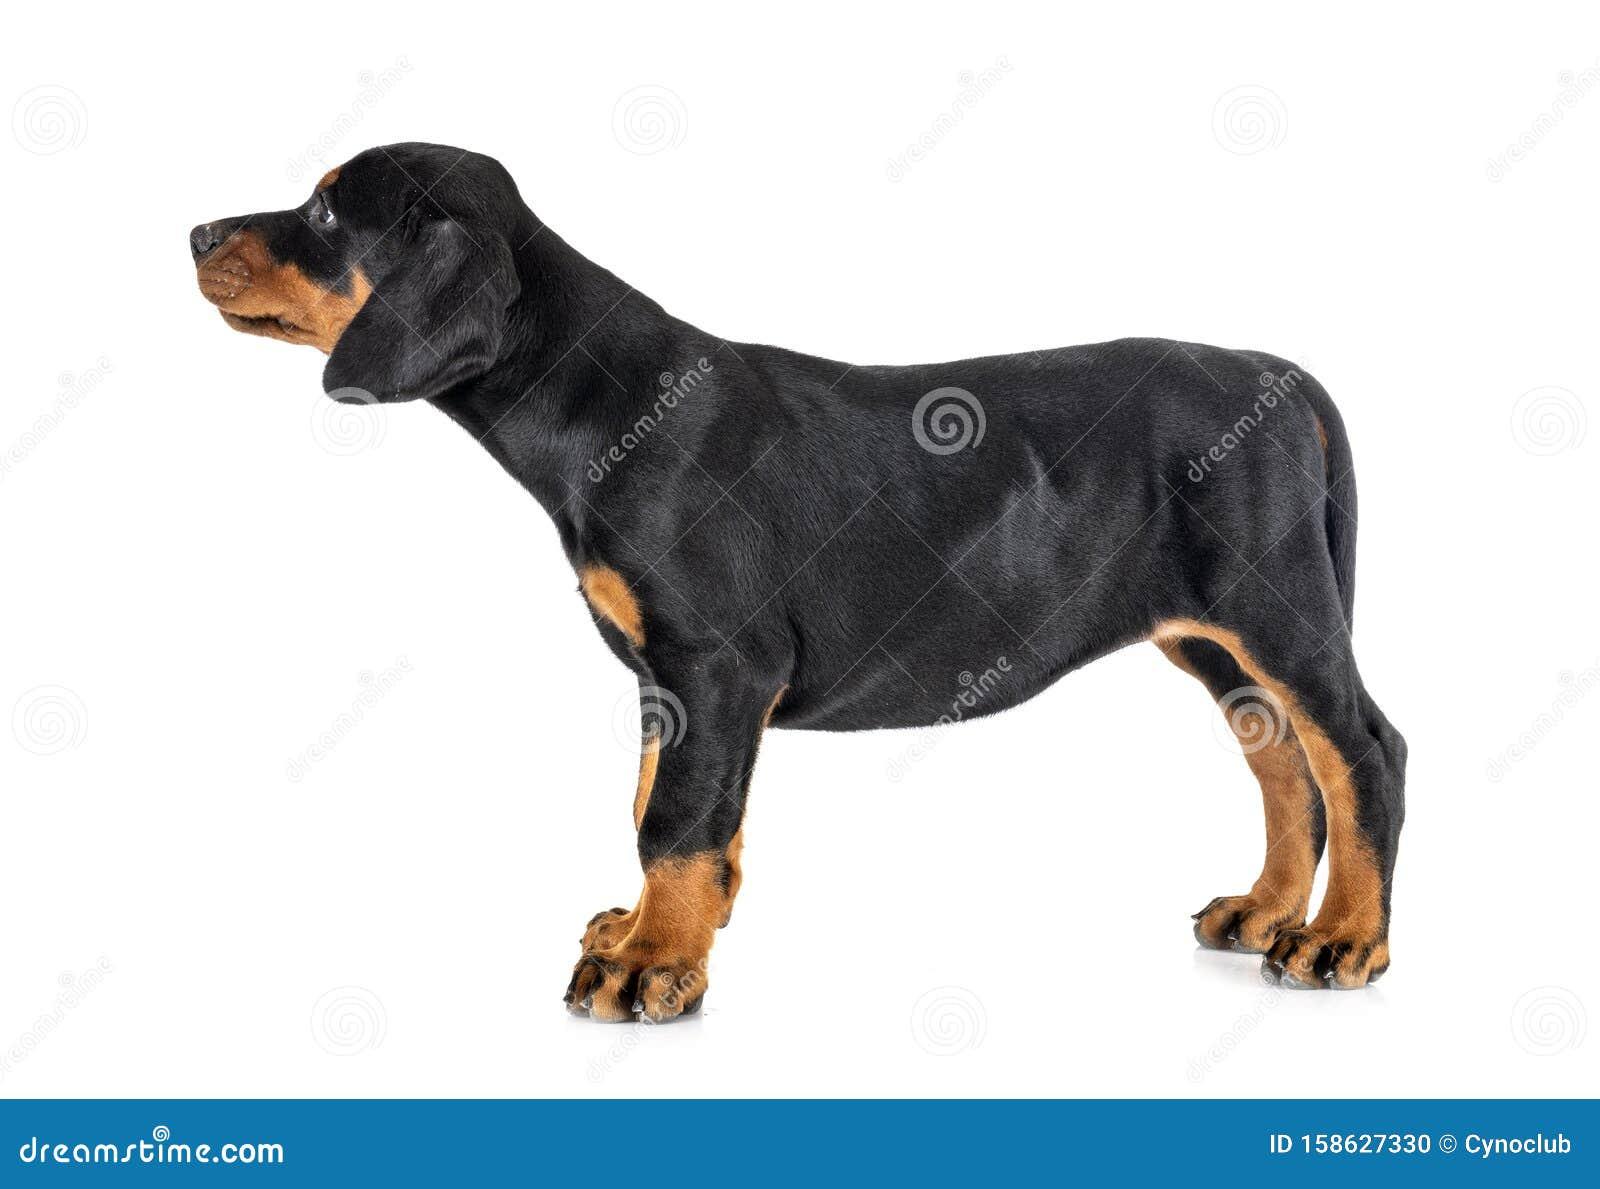 Puppy Doberman Pinscher Stock Photo Image Of Guard 158627330